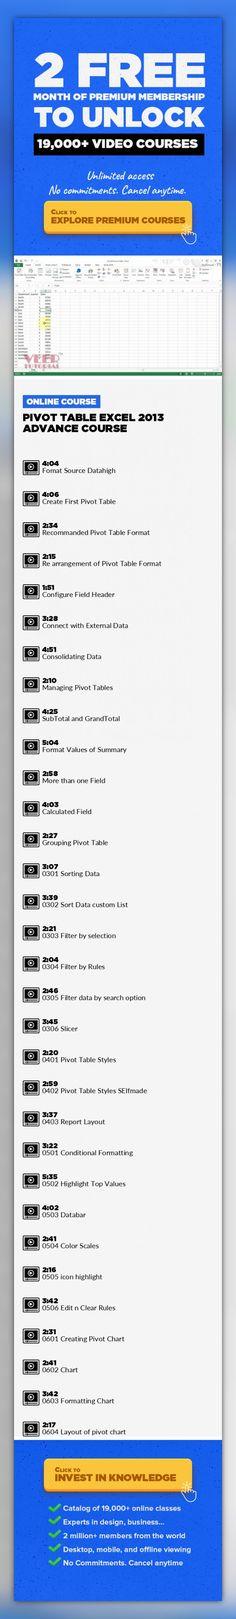 Excel Pivot Tables 12 Microsoft Excel Pinterest Pivot table